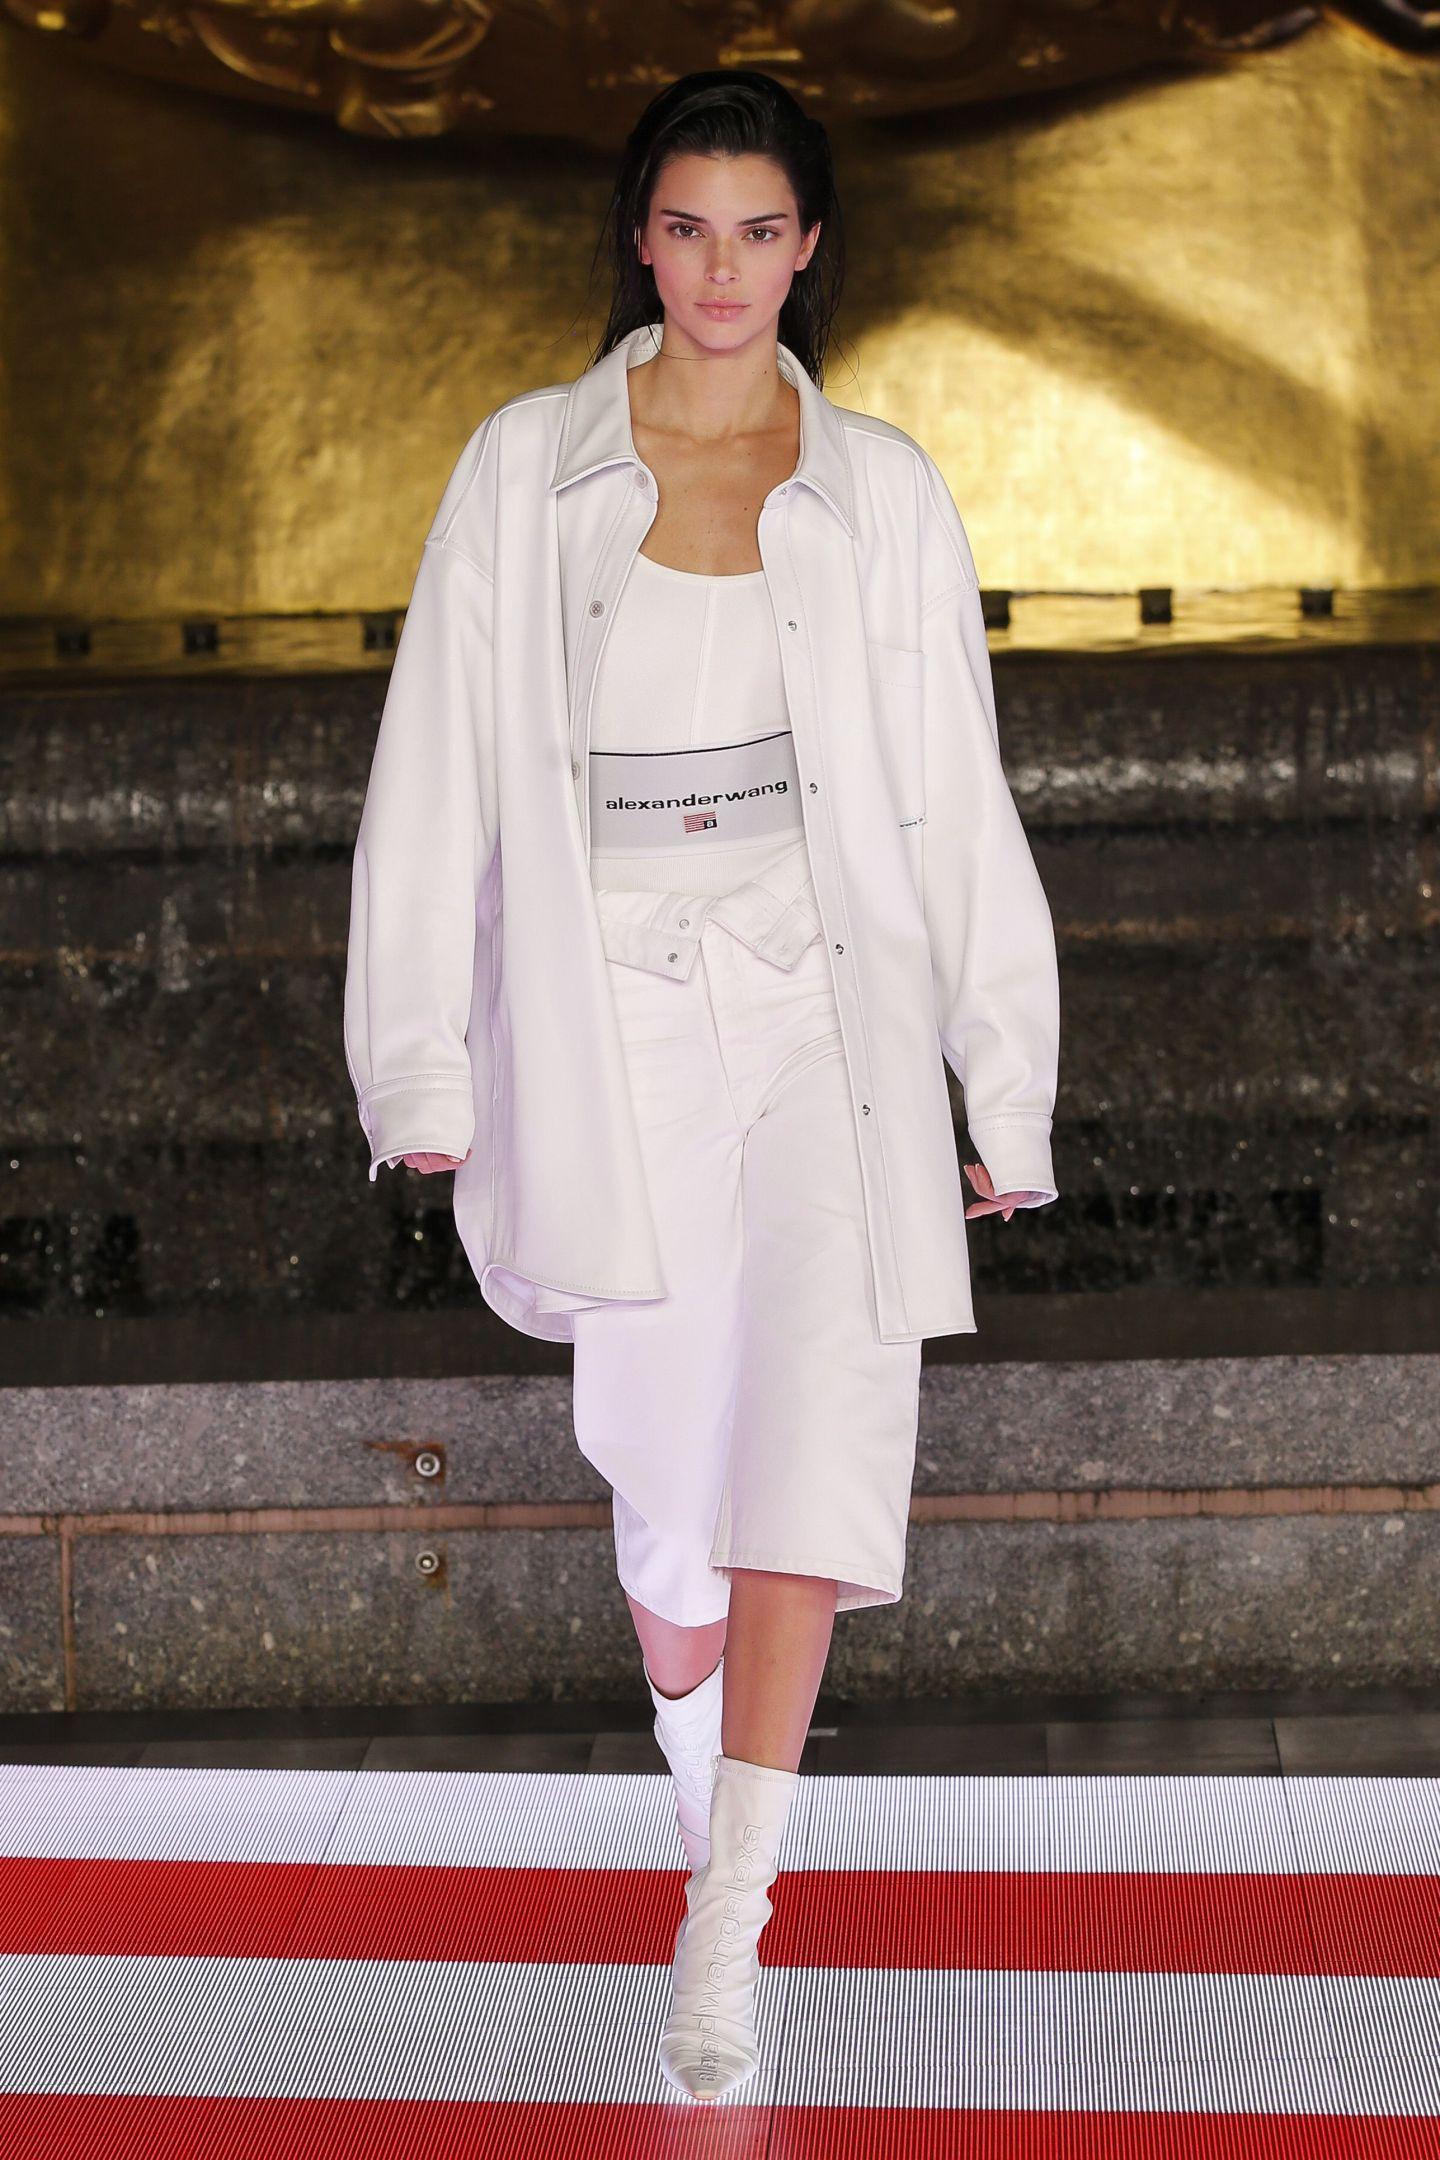 White, Clothing, Fashion, Fashion model, Beauty, Pink, Fashion show, Fashion design, Outerwear, Uniform,